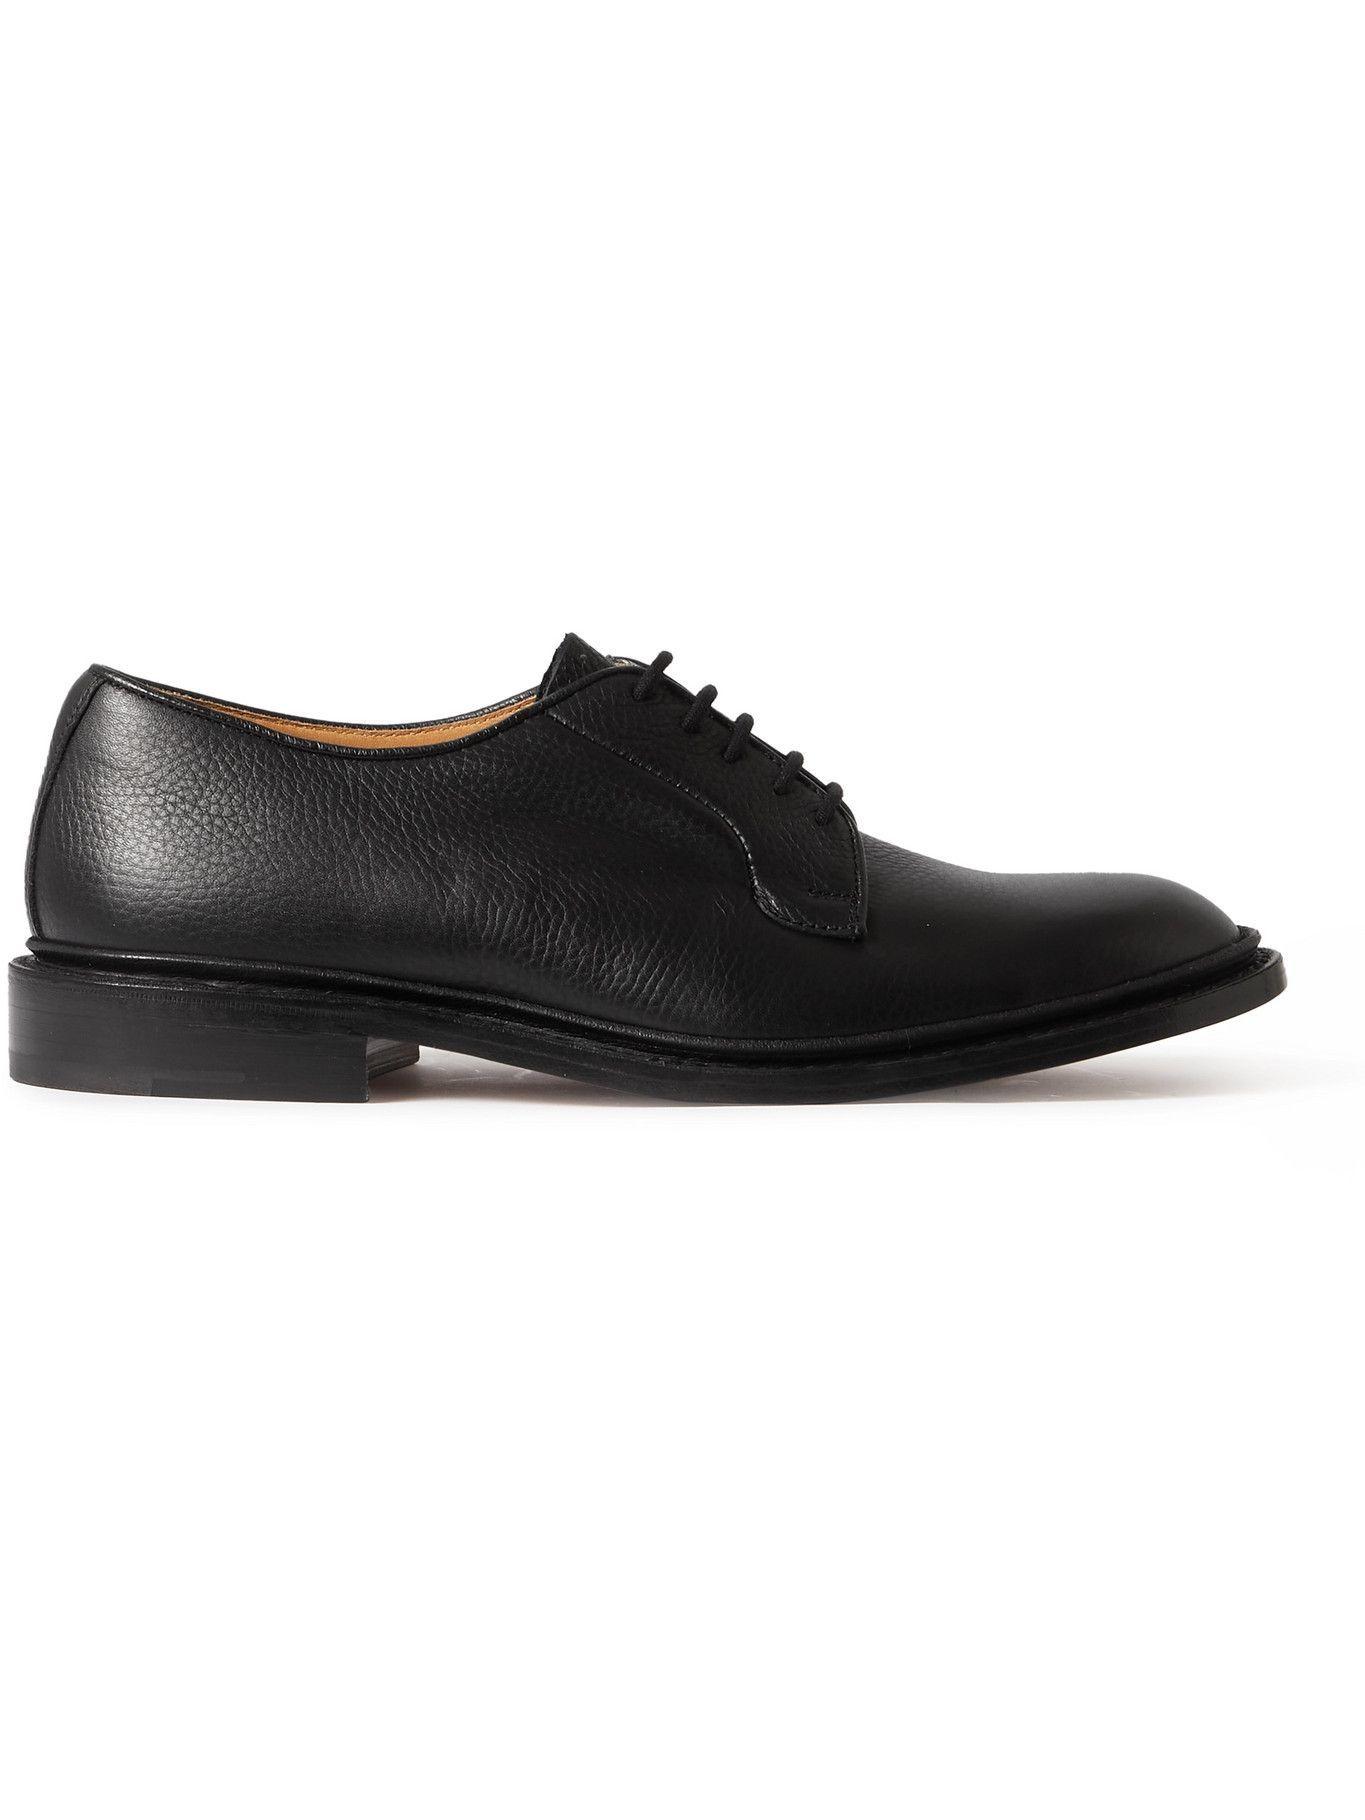 Photo: Tricker's - Robert Full-Grain Leather Derby Shoes - Black